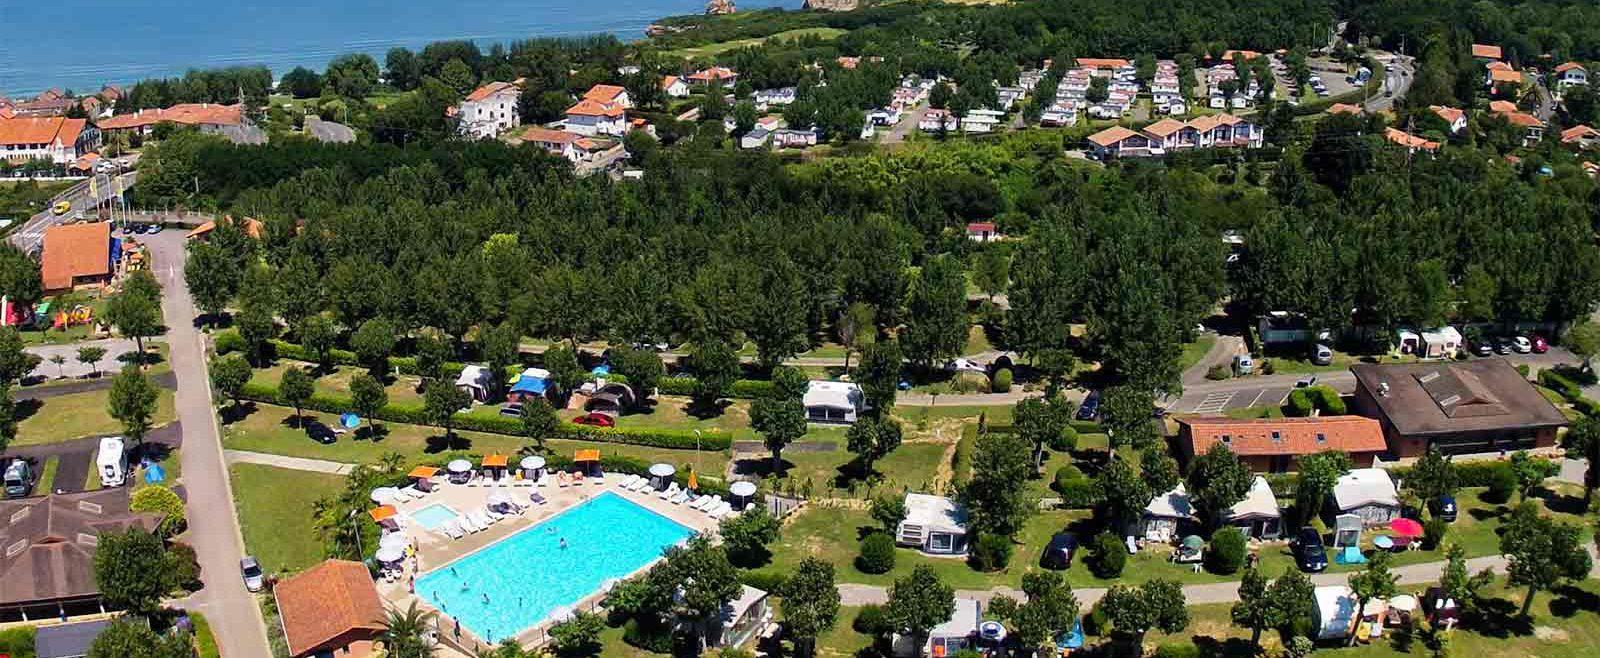 Camping Ametza, Hendaye, Pyrénées-Atlantiques